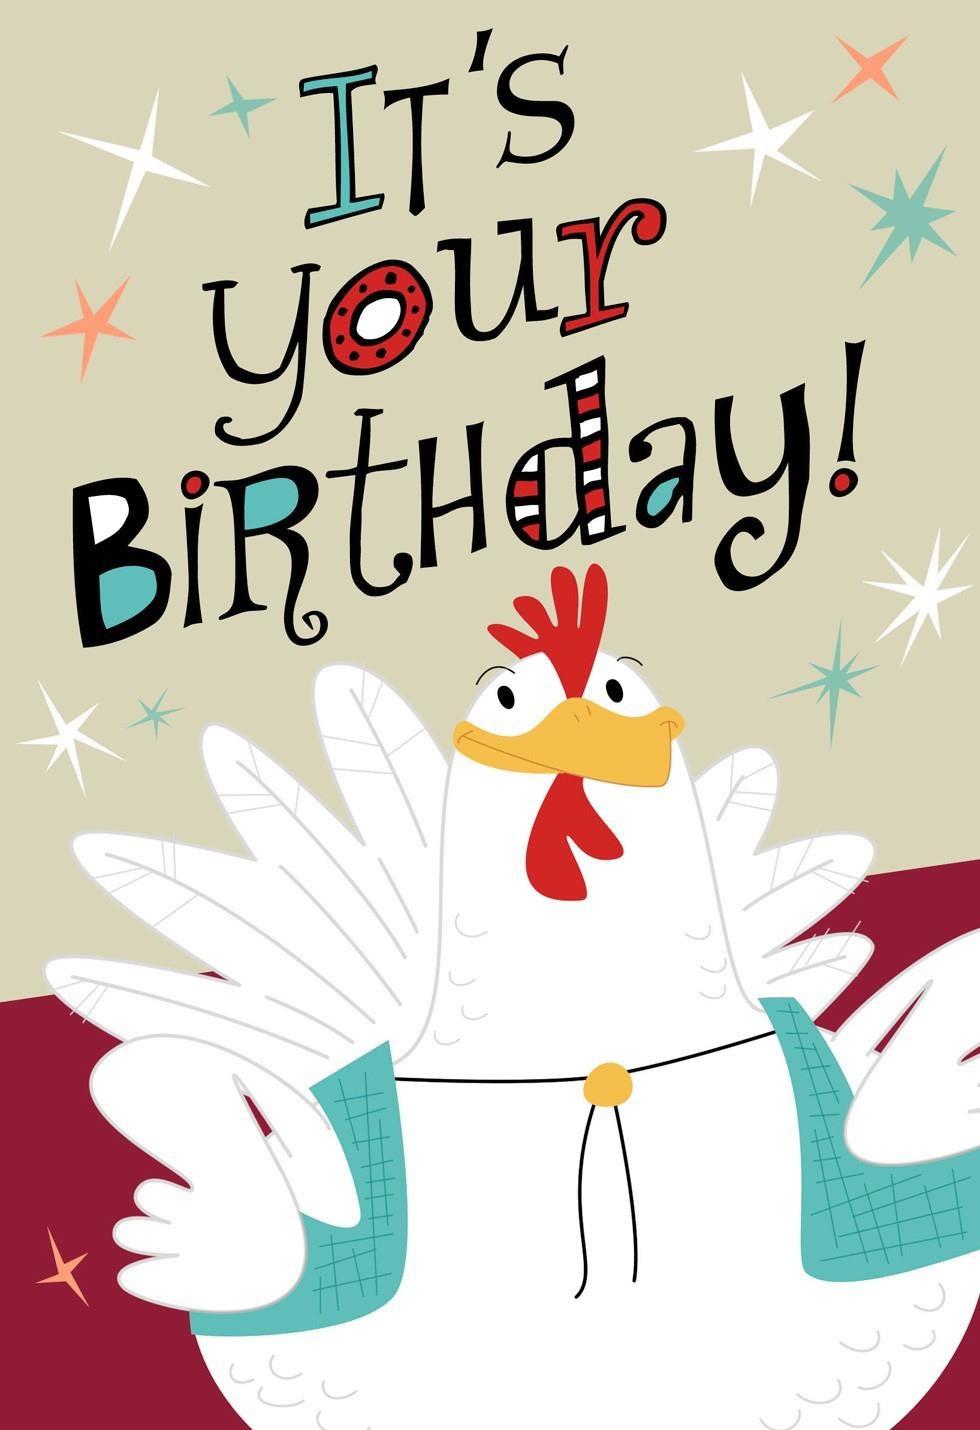 Hallmark Birthday Cards -Free Printable Hallmark Birthday Cards – Dozor - Free Printable Hallmark Birthday Cards